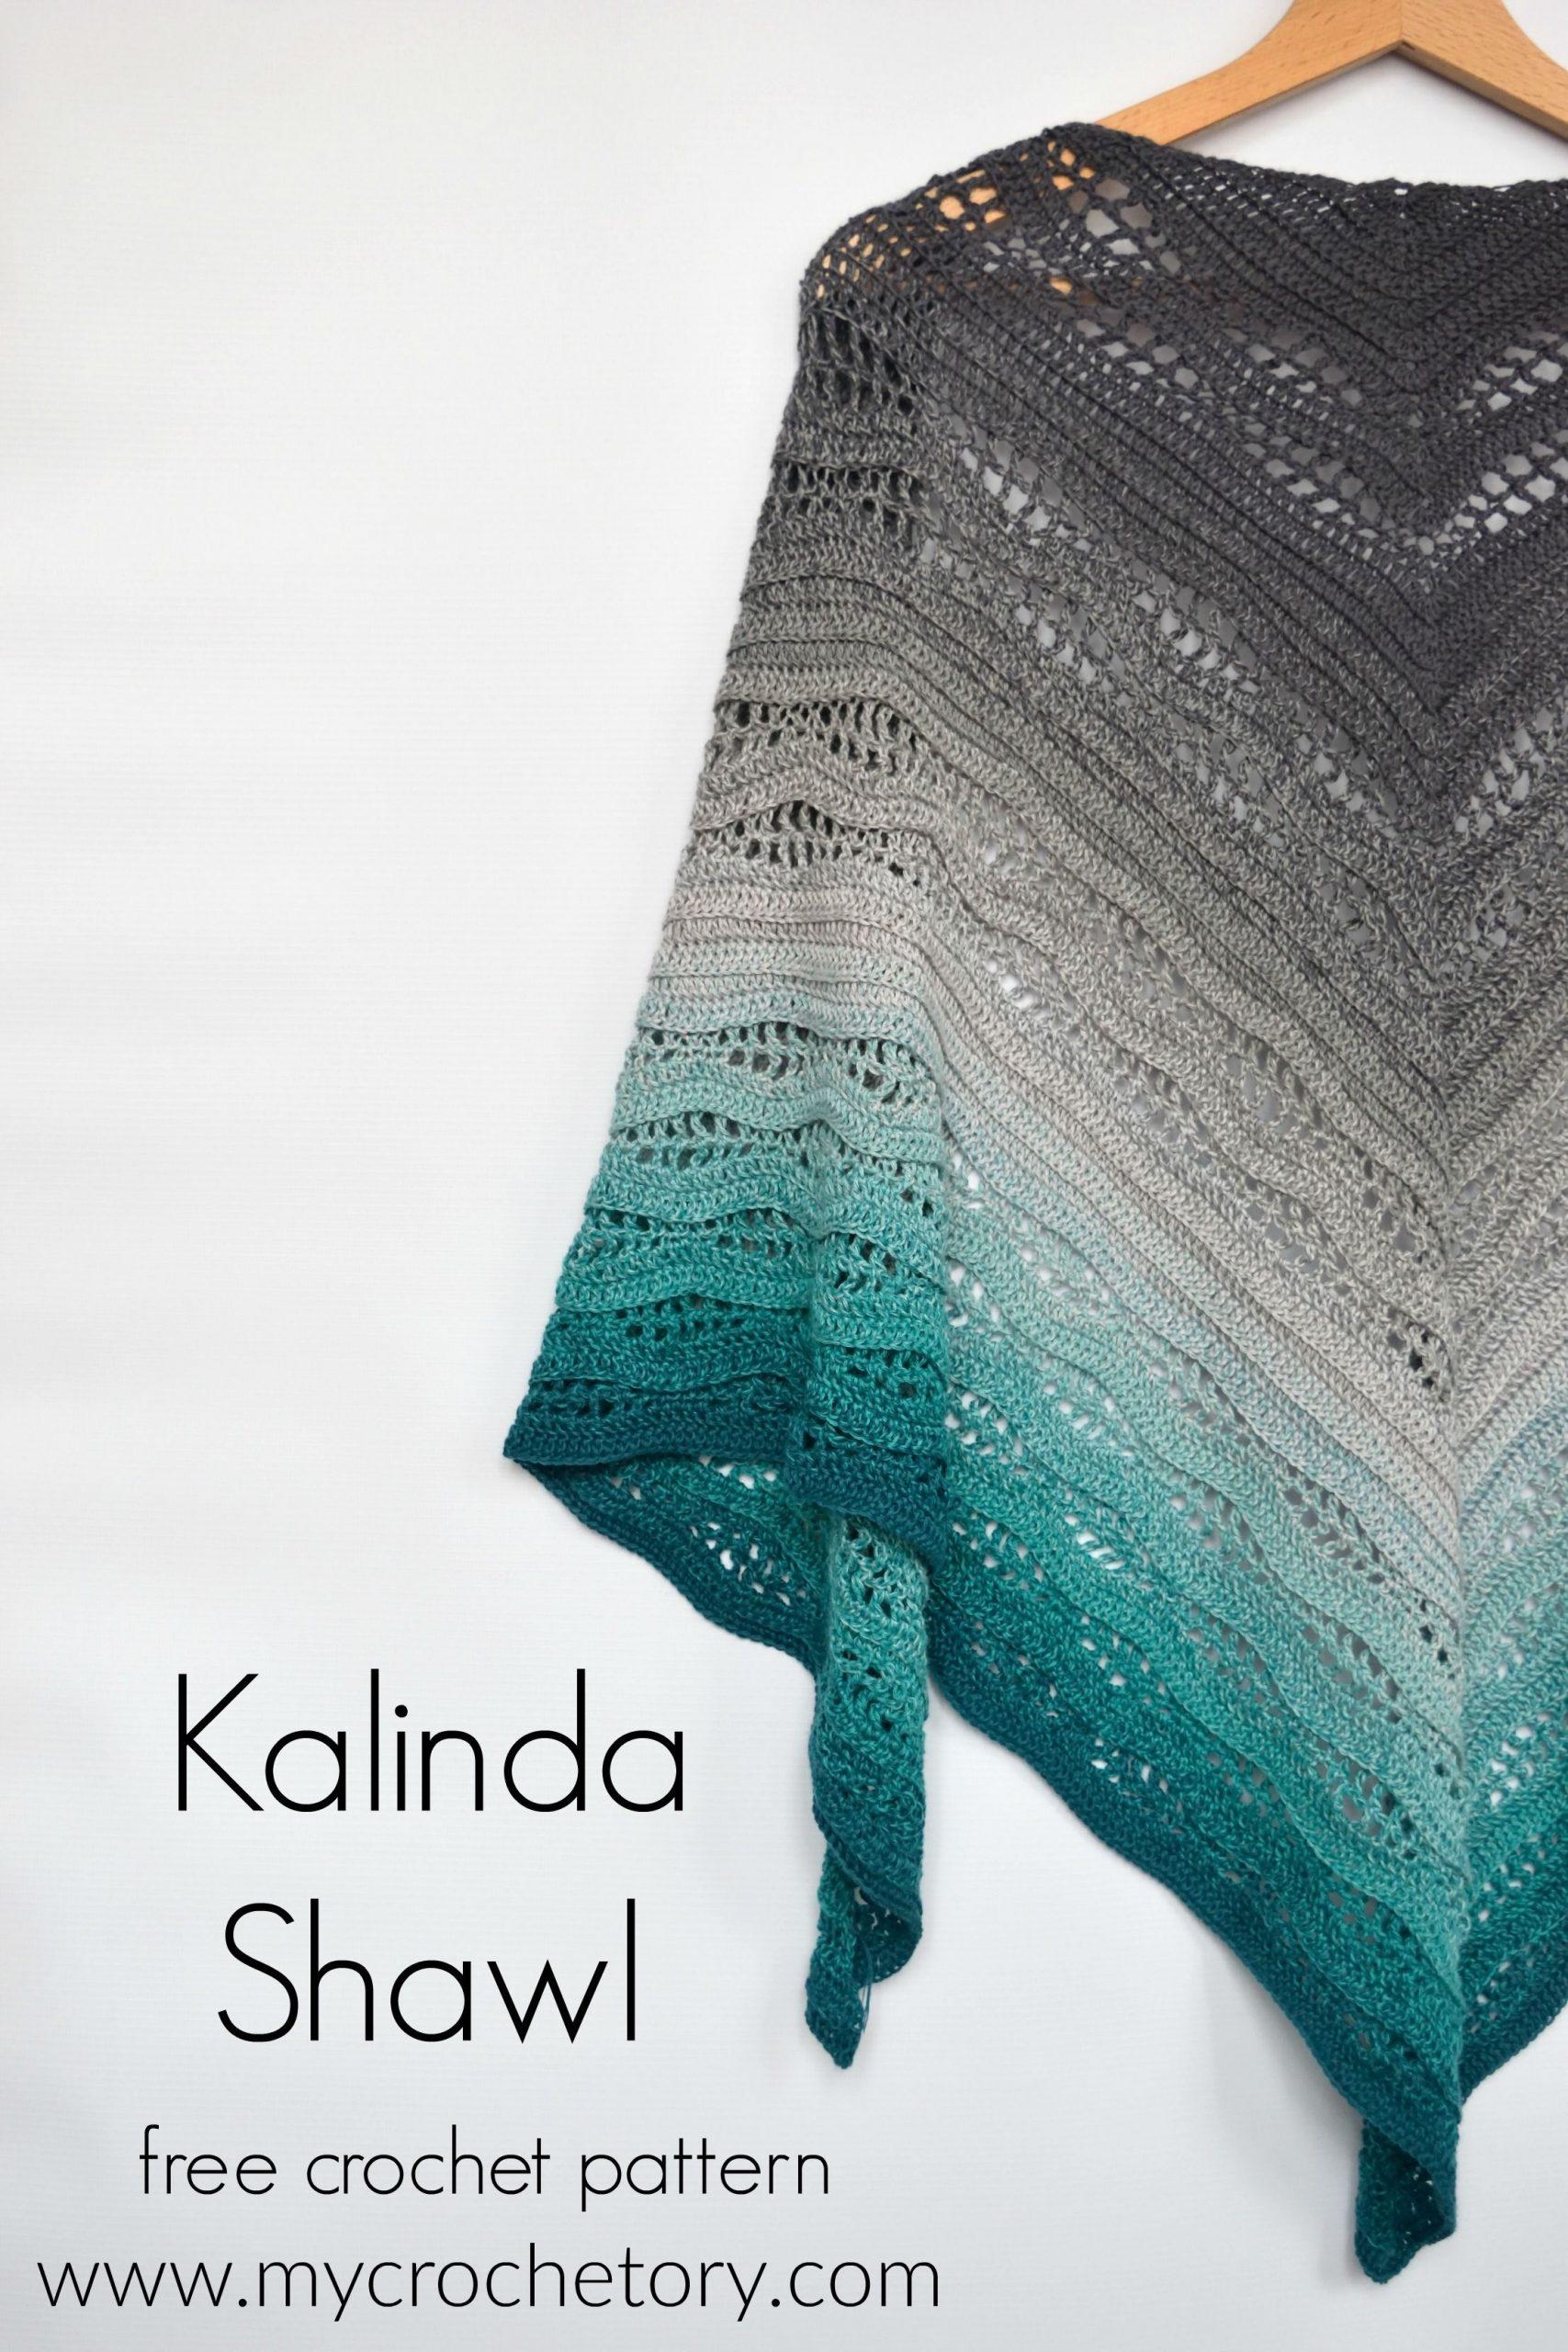 Kalinda Shawl – free crochet pattern by